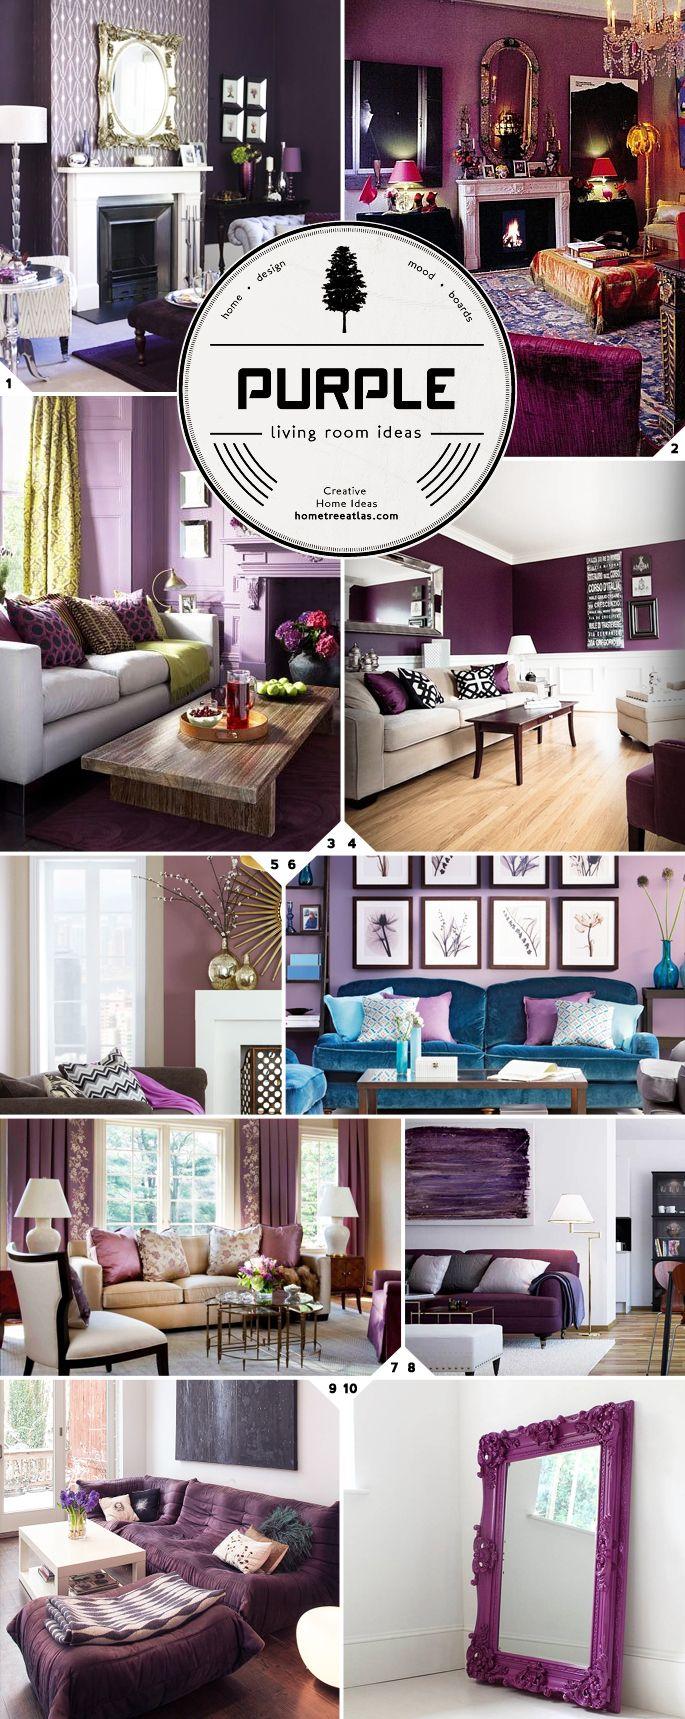 Purple living room design ideas..